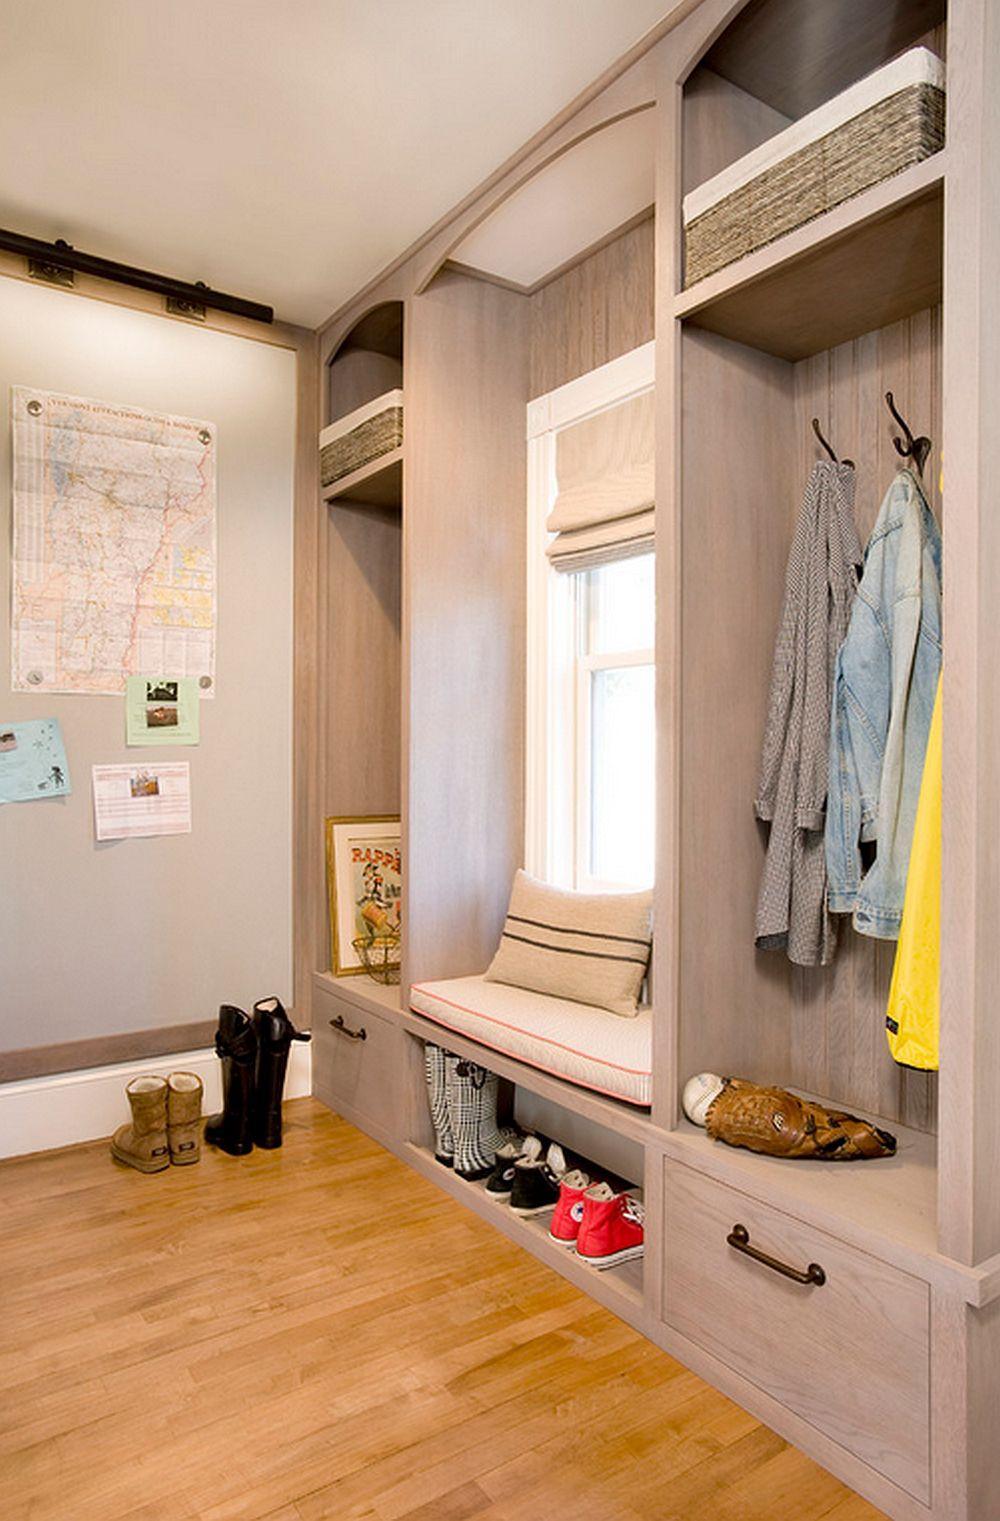 adelaparvu.com despre casa rustica in culori pastel, designer Karen Tager (8)